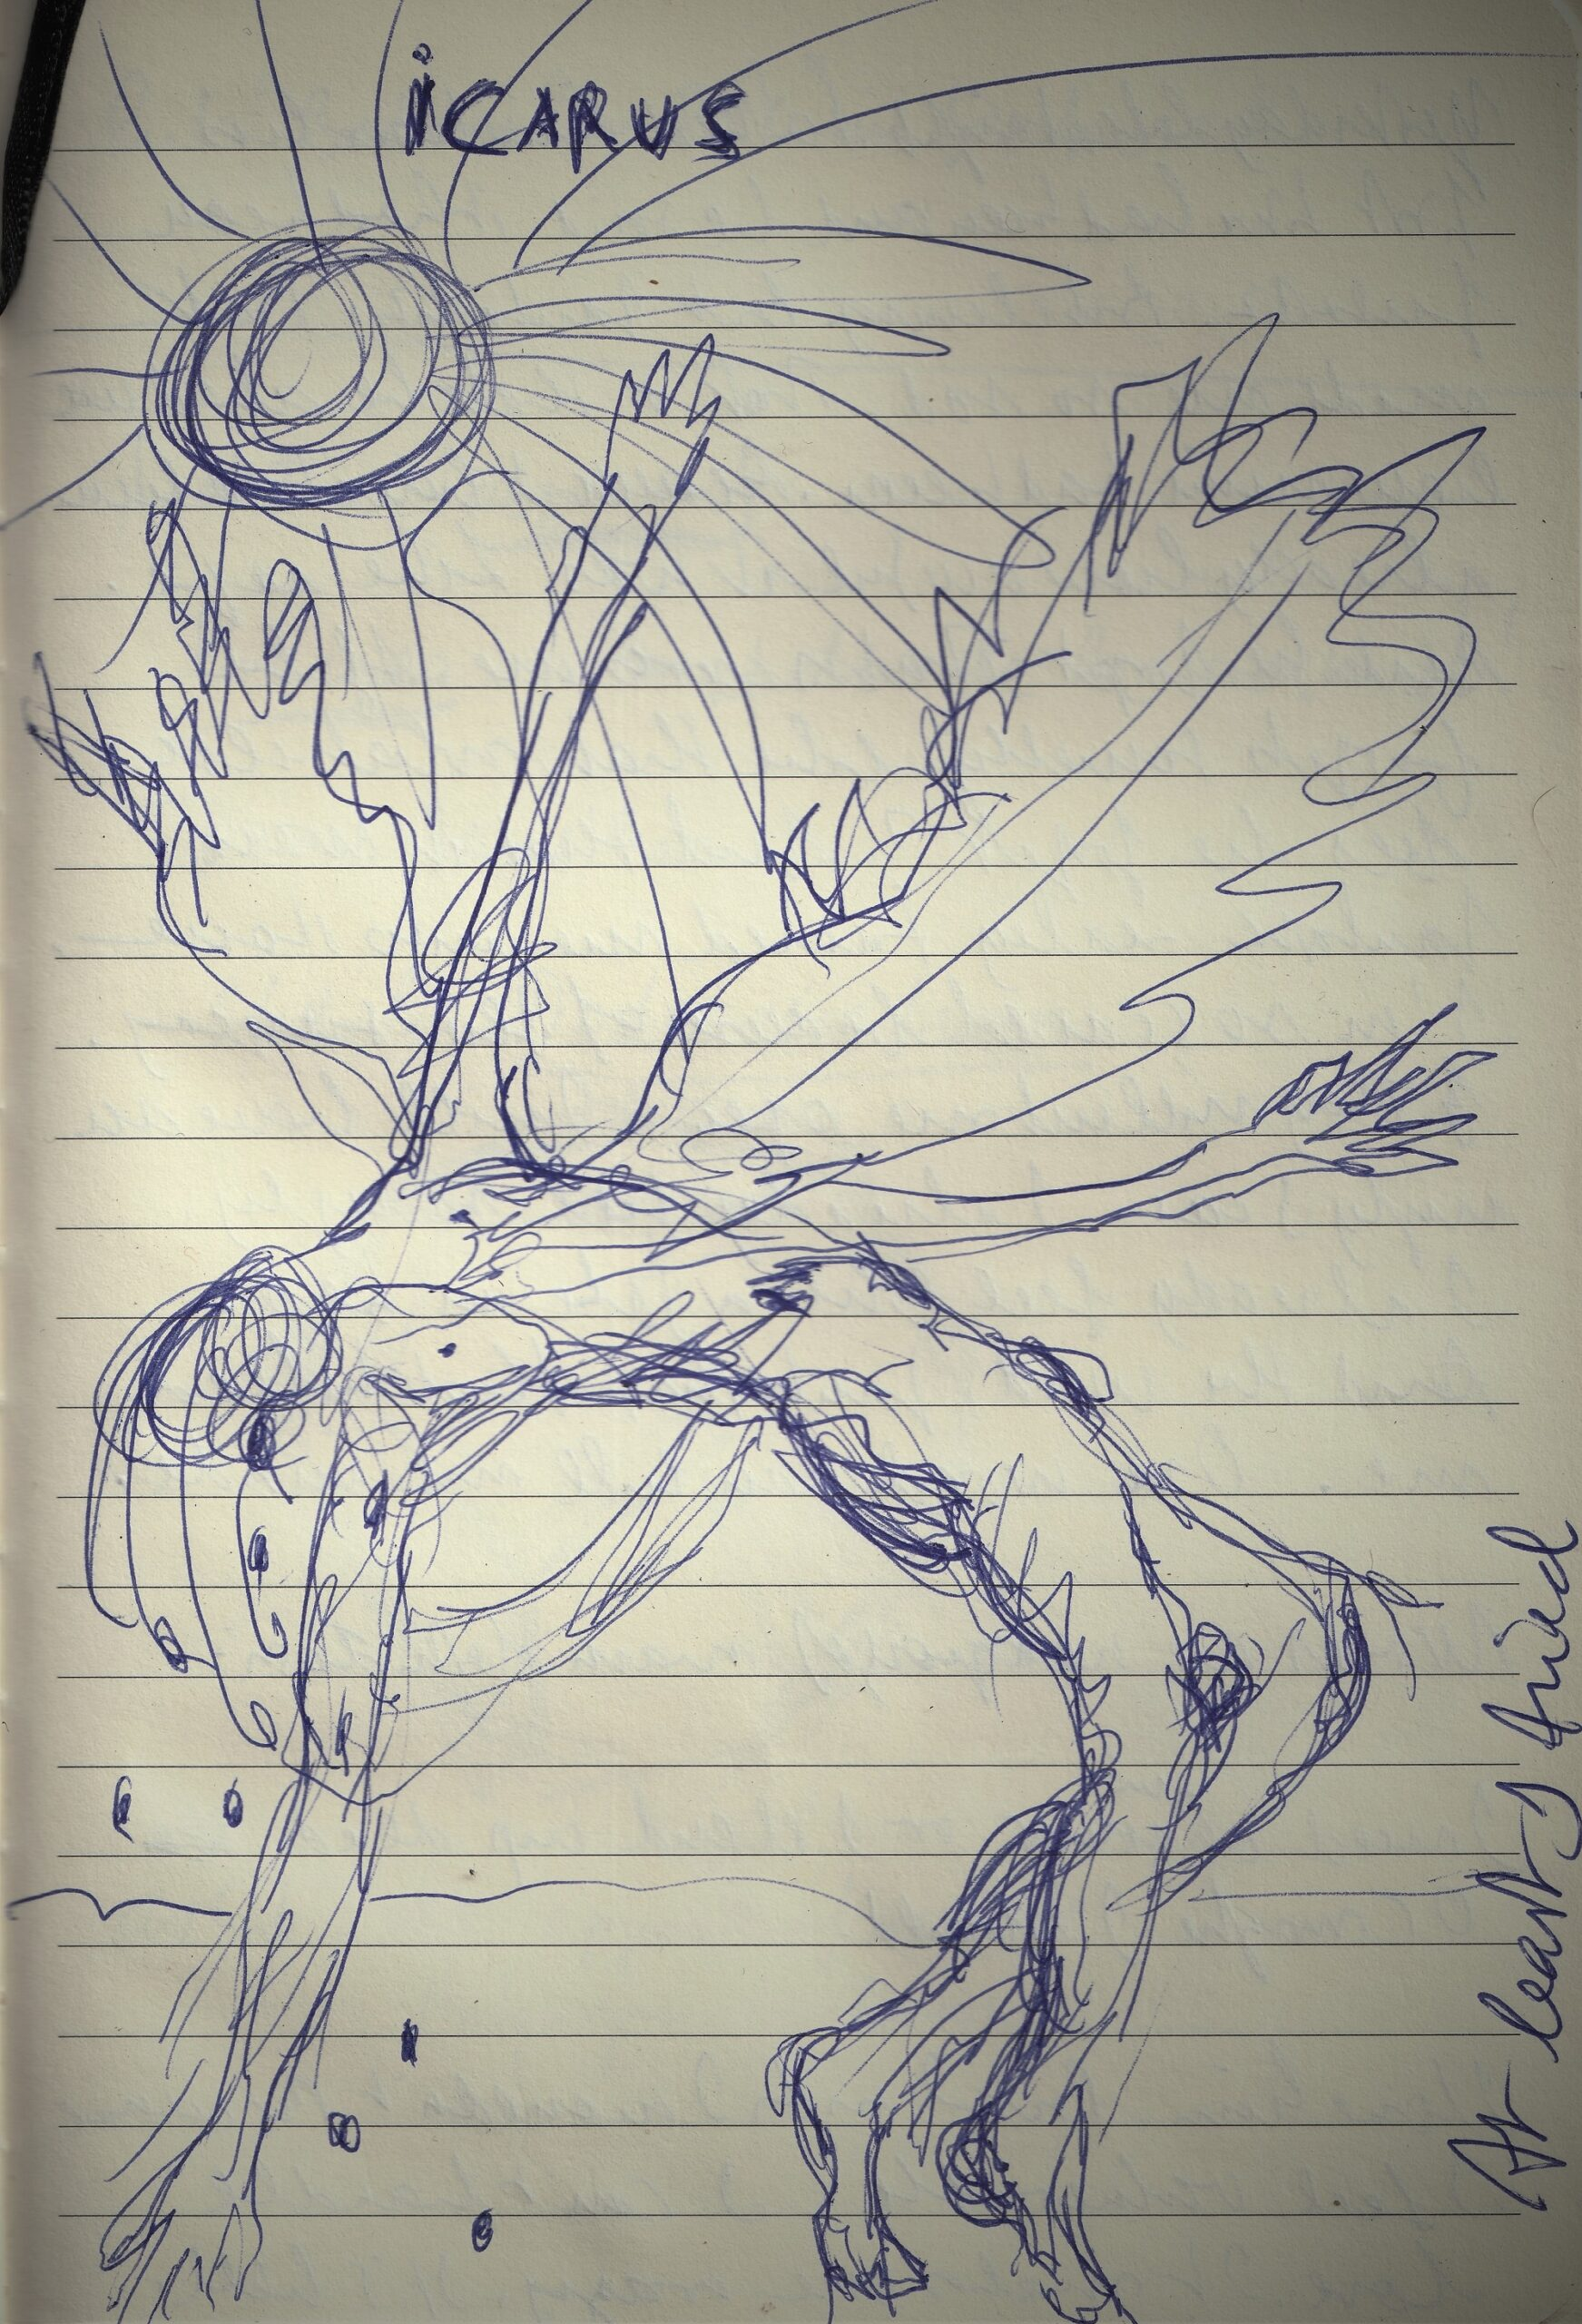 Icarus vignette